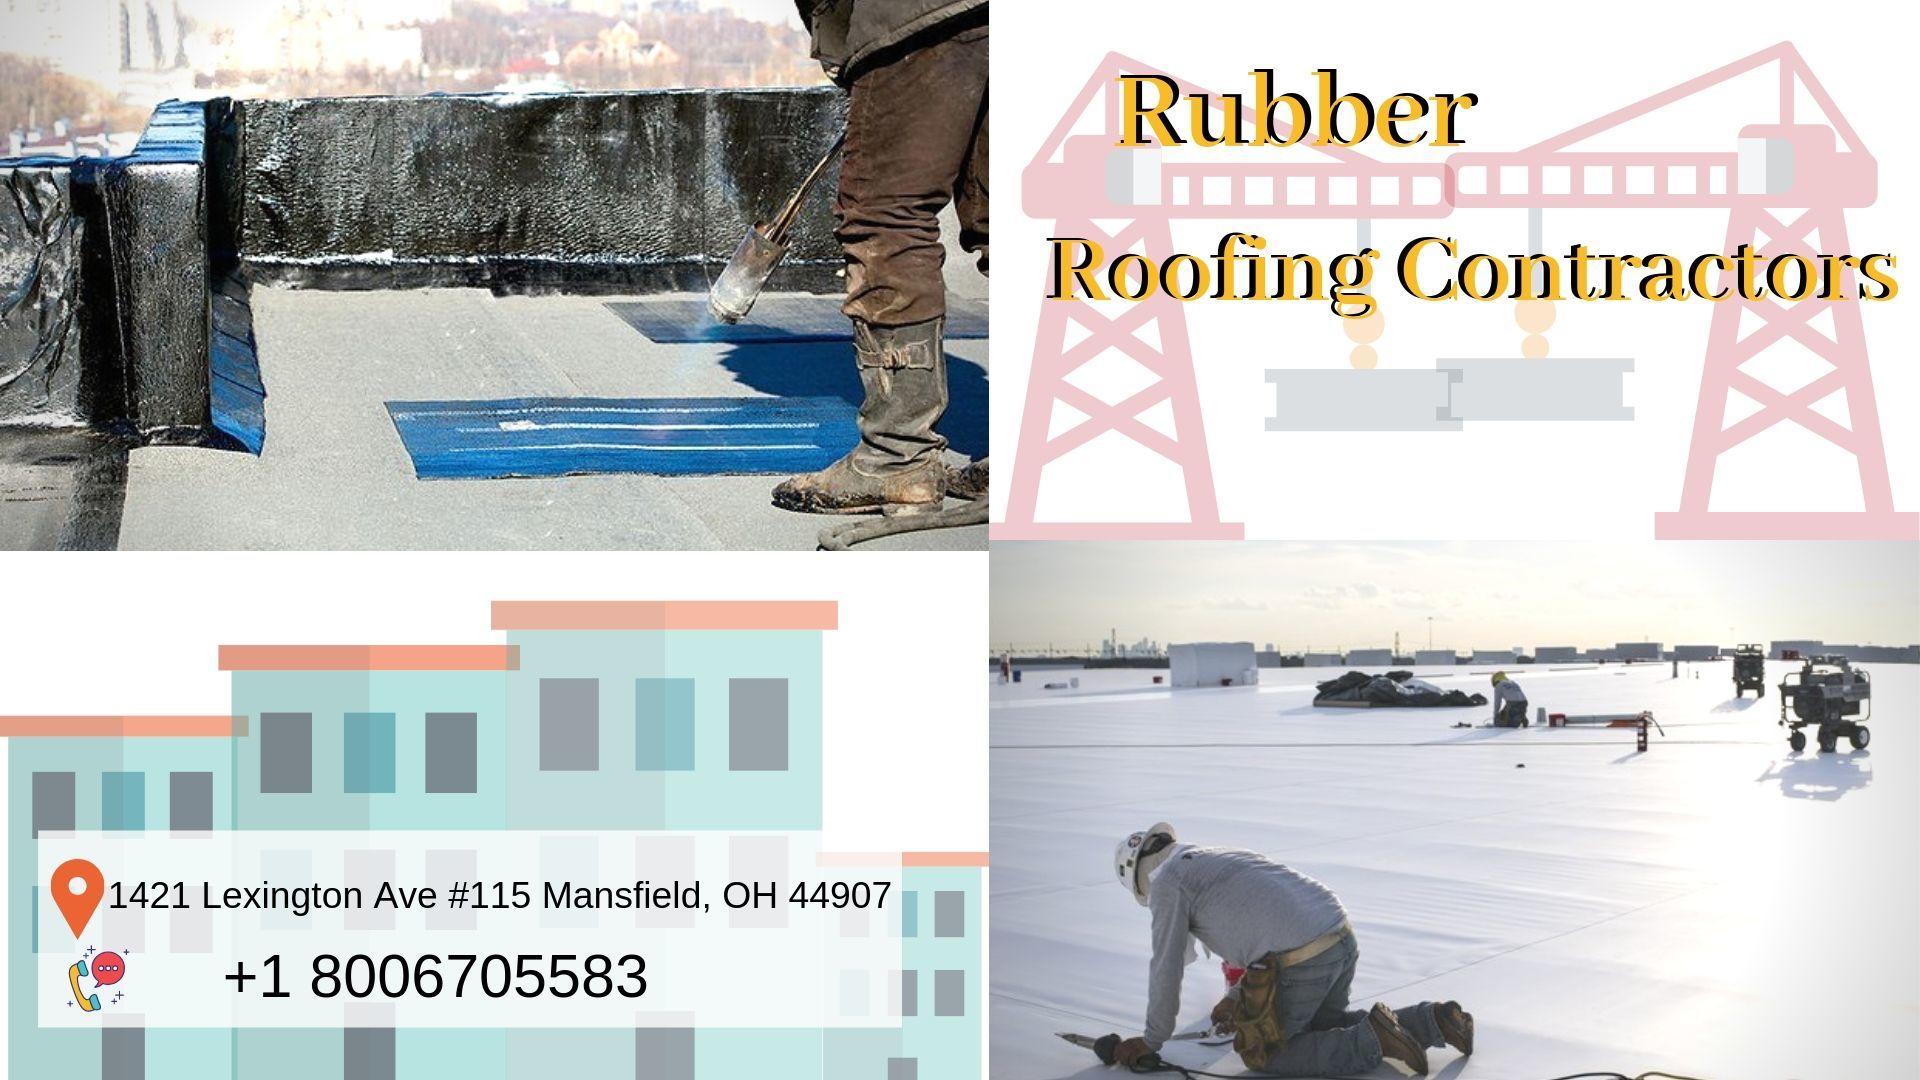 Rubber Roofing Contractors